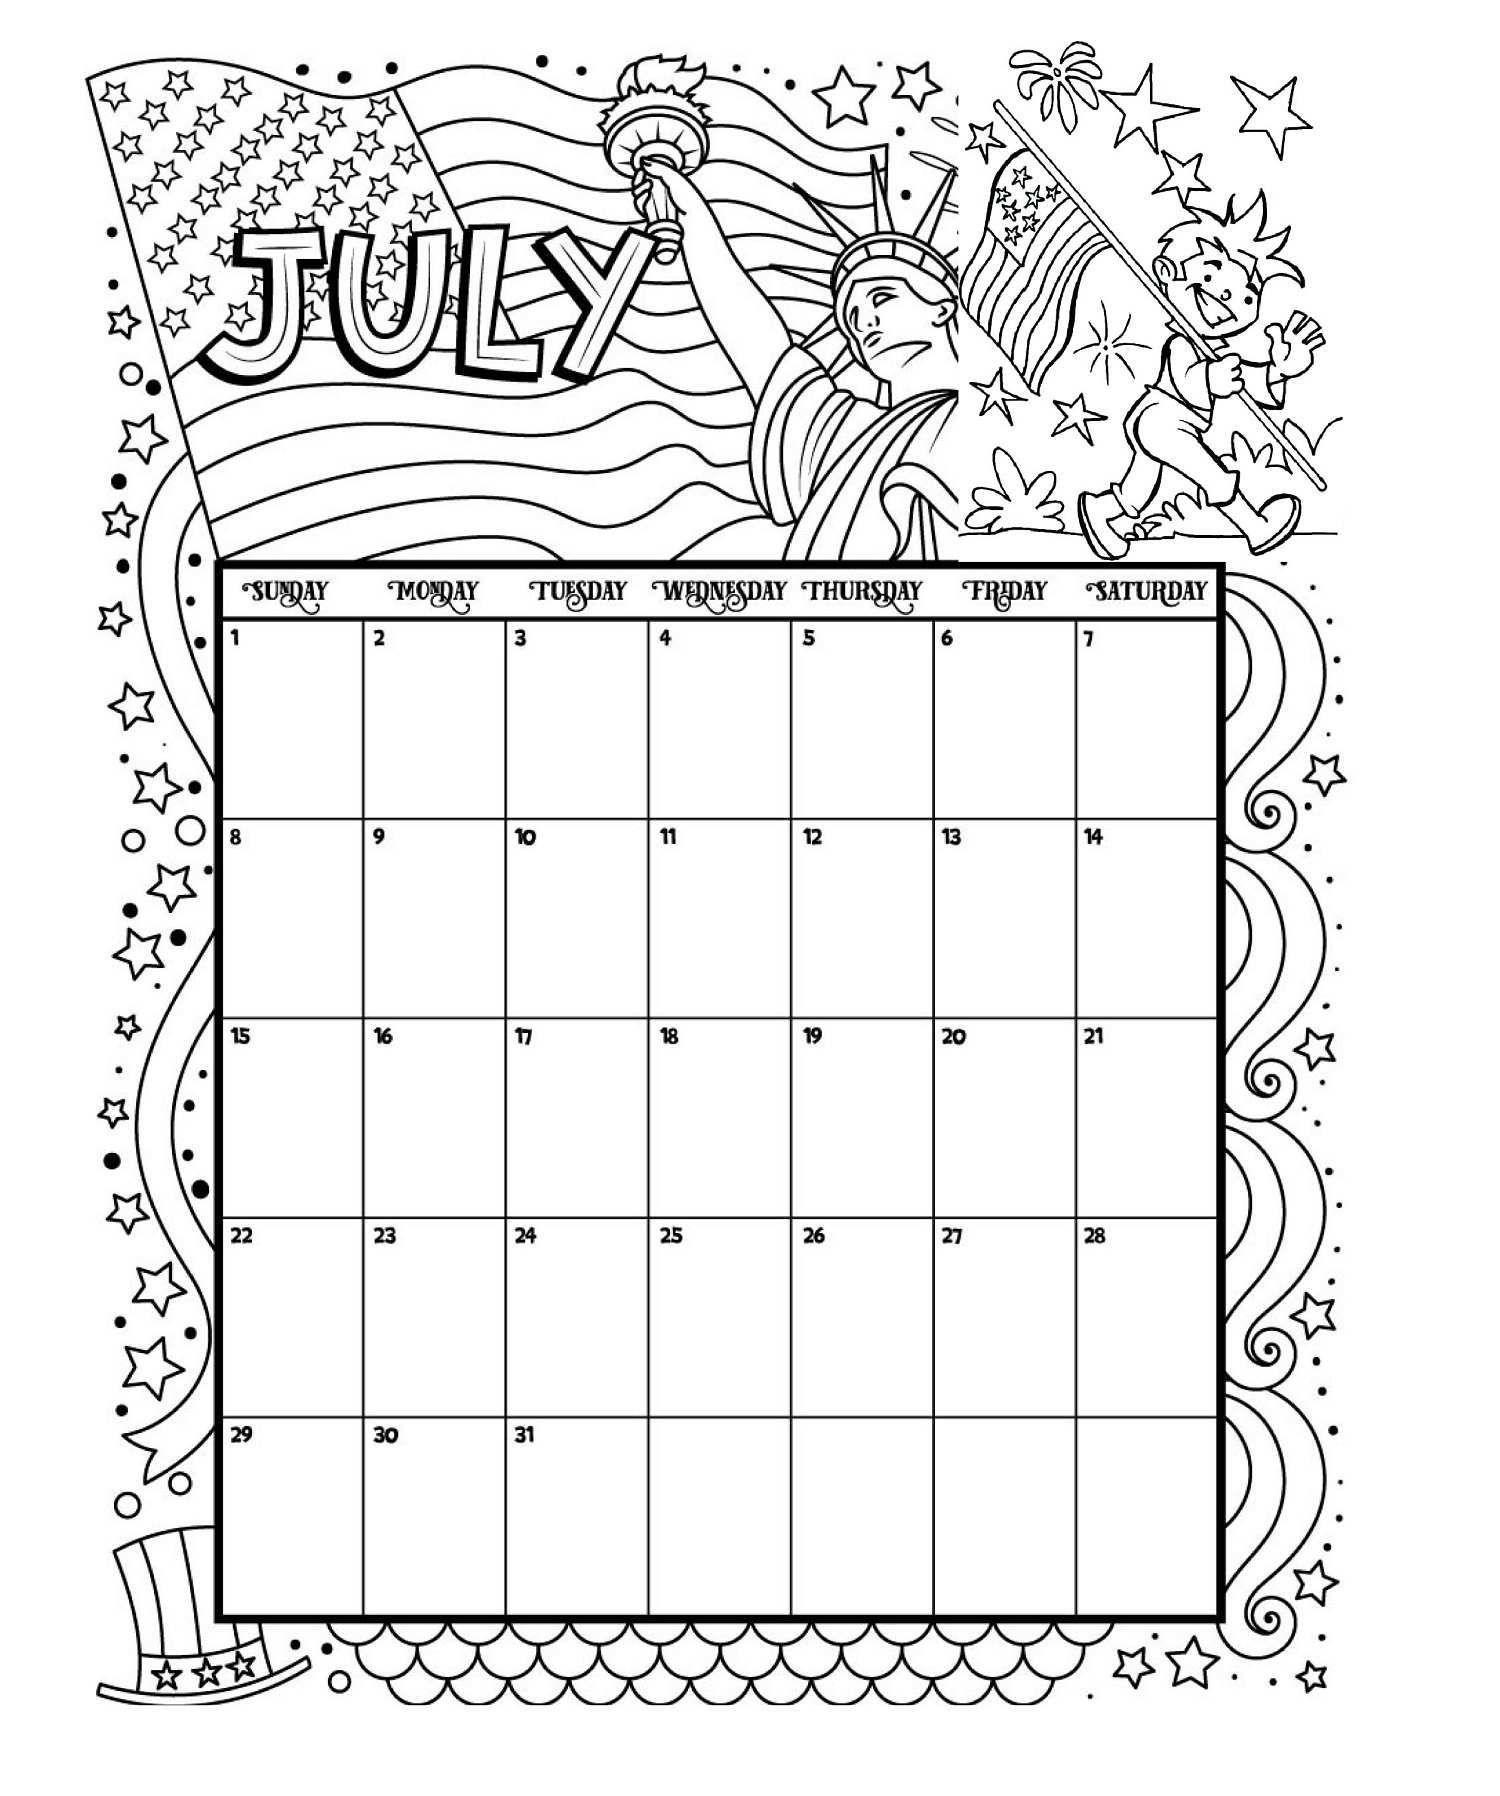 Printable Colouring Calendar 2019 в 2020 г